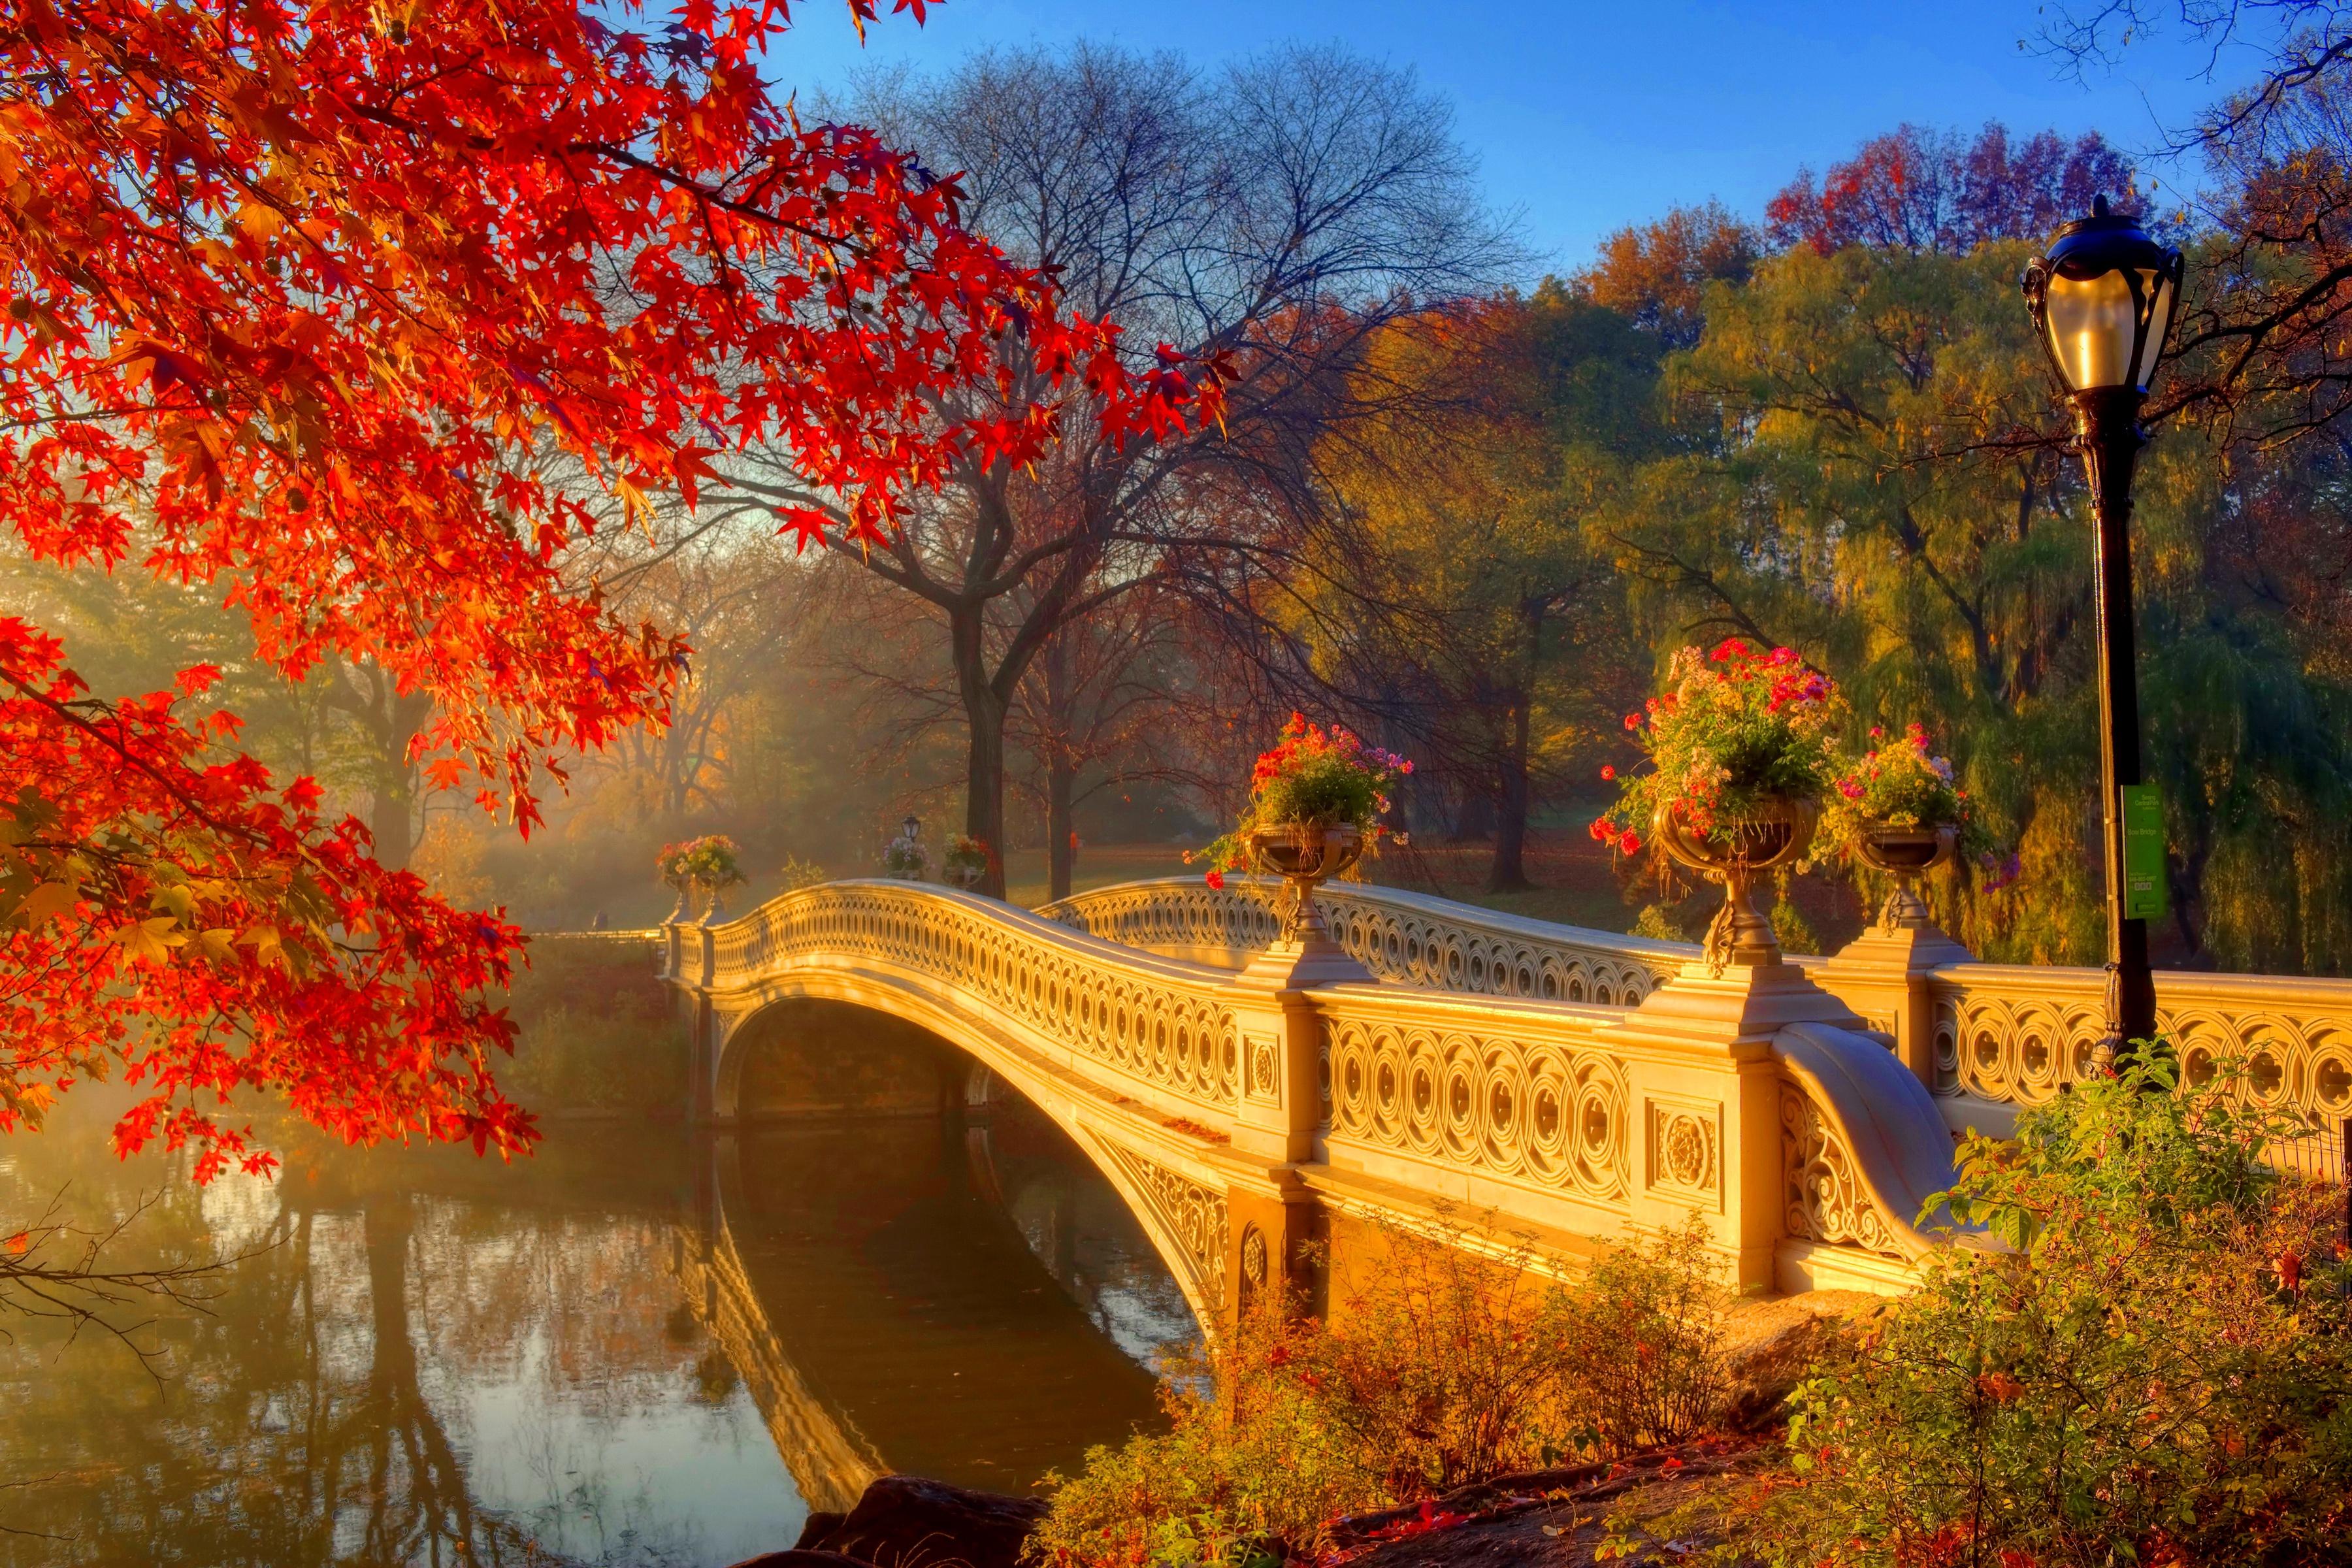 природа страны архитектура река мост Александр  № 2234648 бесплатно